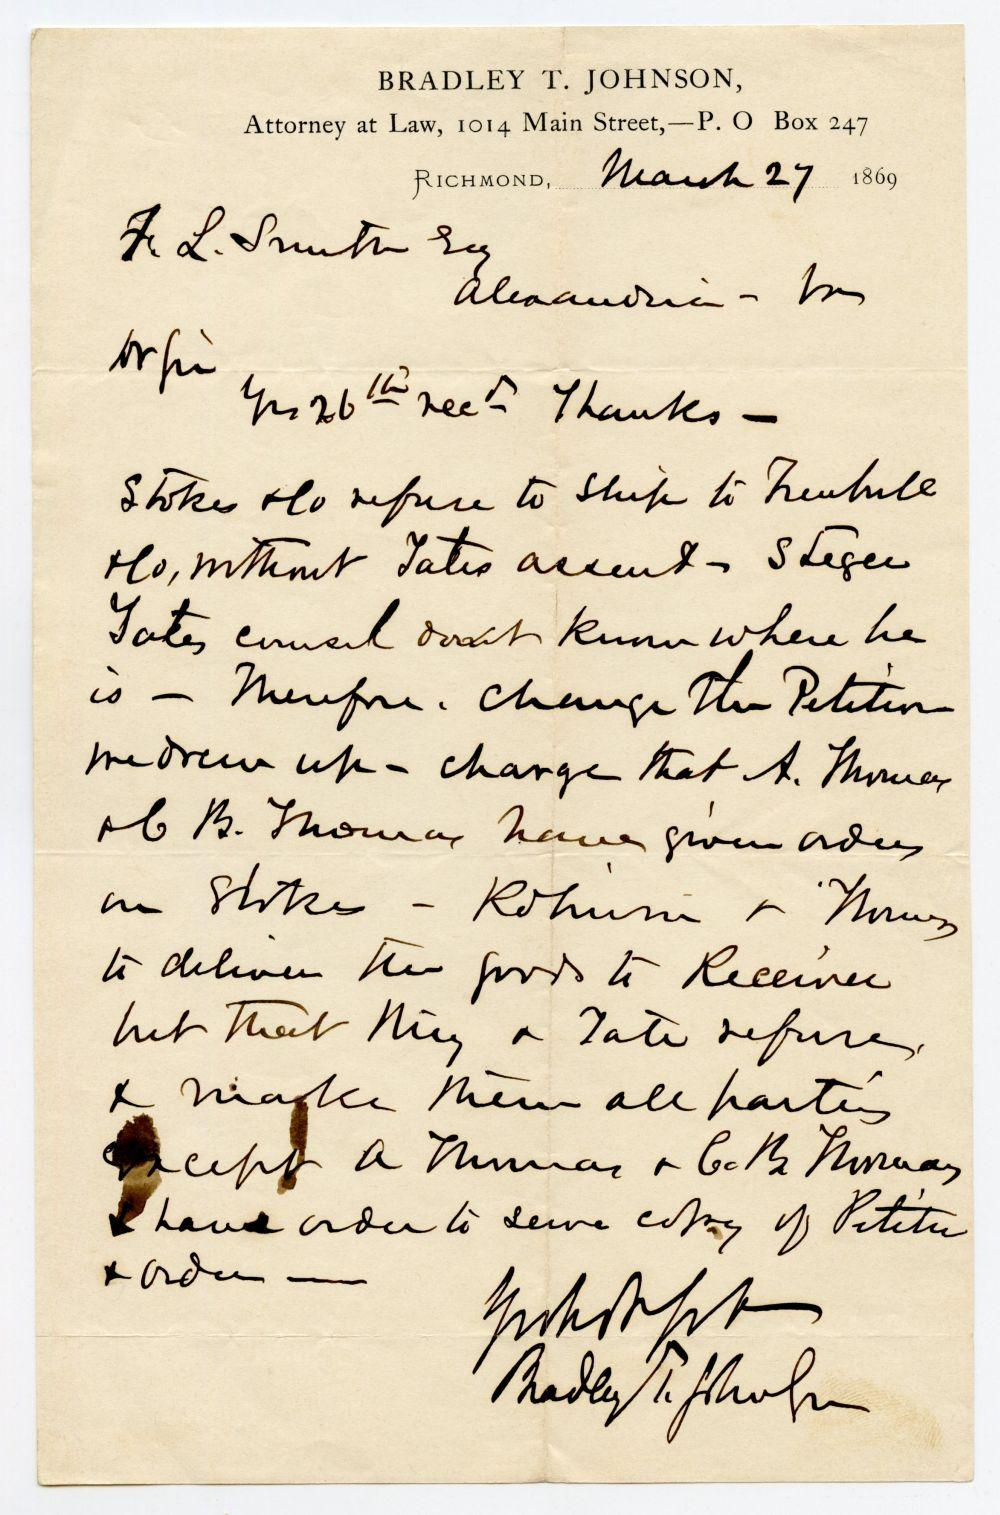 Post-Civil War Confederate General Letter